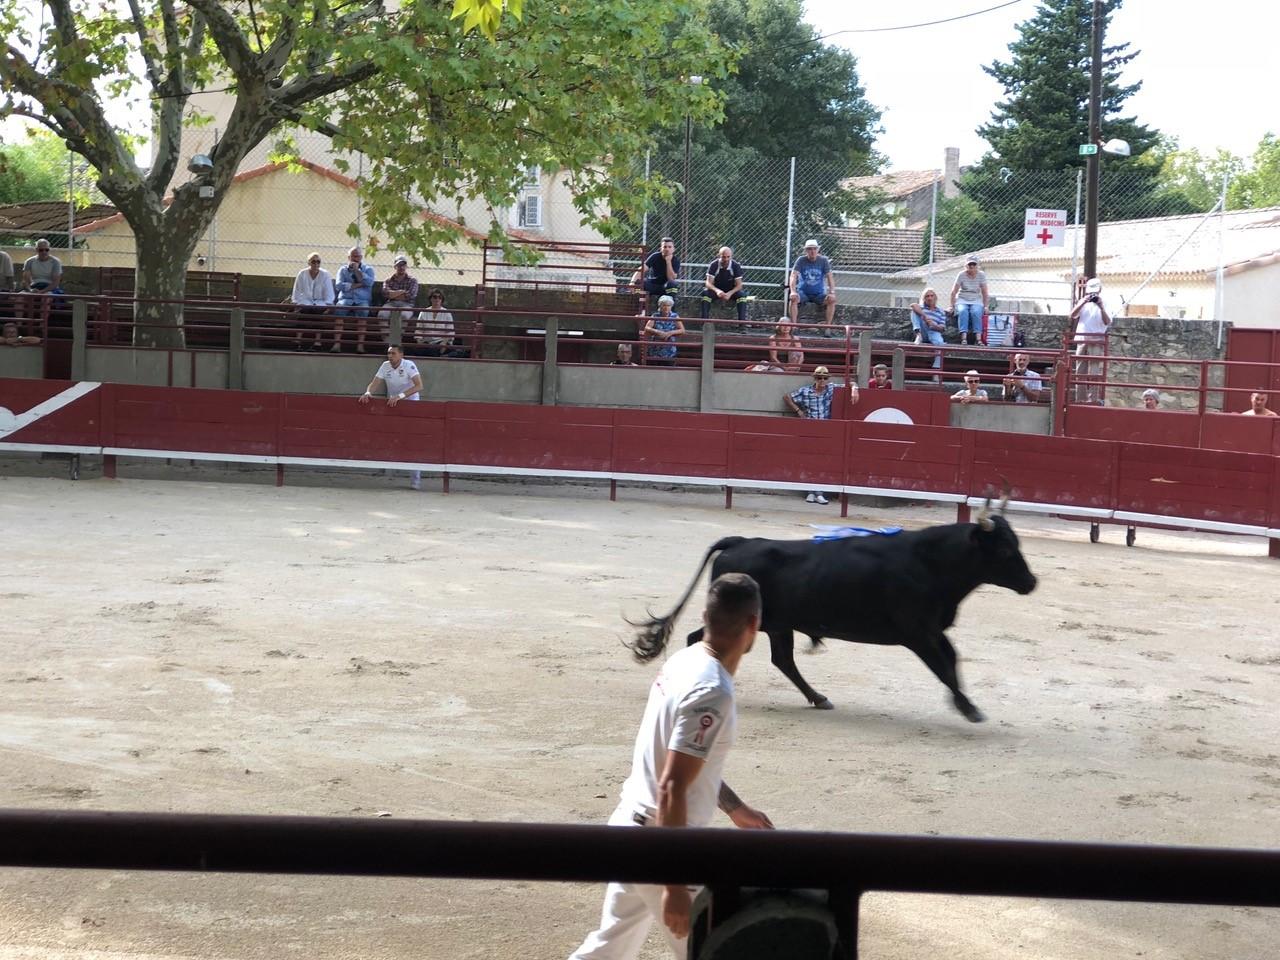 Bullfight event